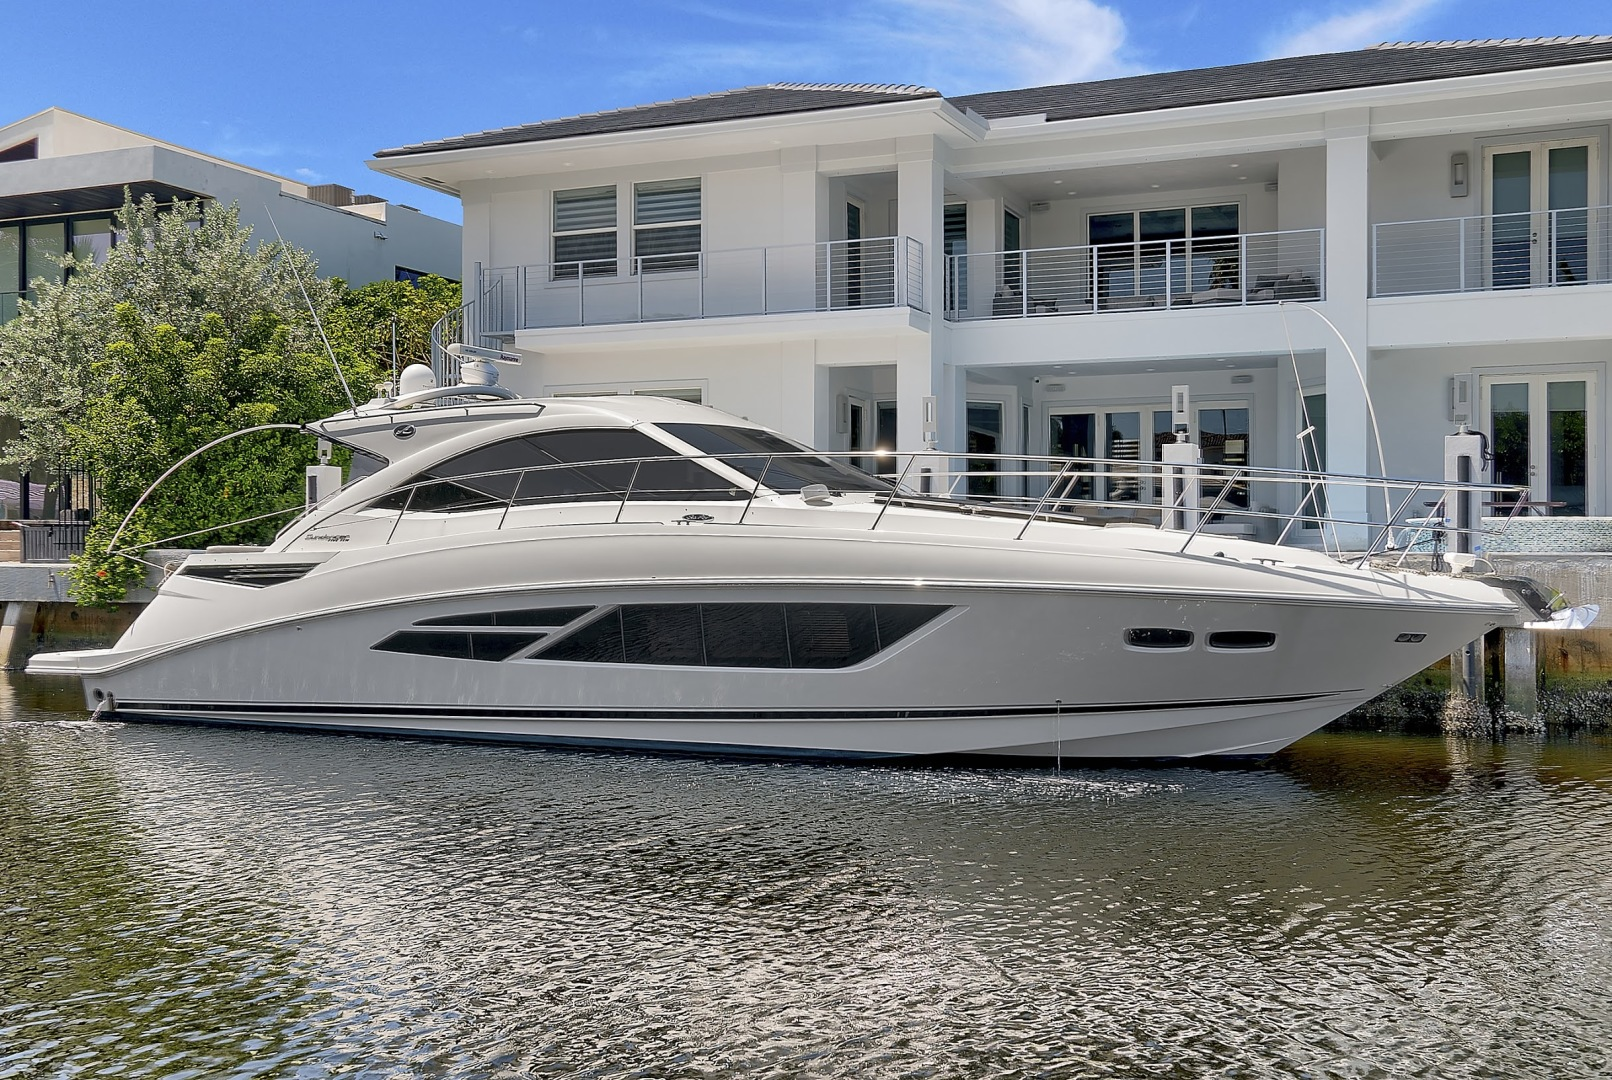 Sea Ray-Sundancer 2014-Lunasea Boca Raton-Florida-United States-1490903   Thumbnail